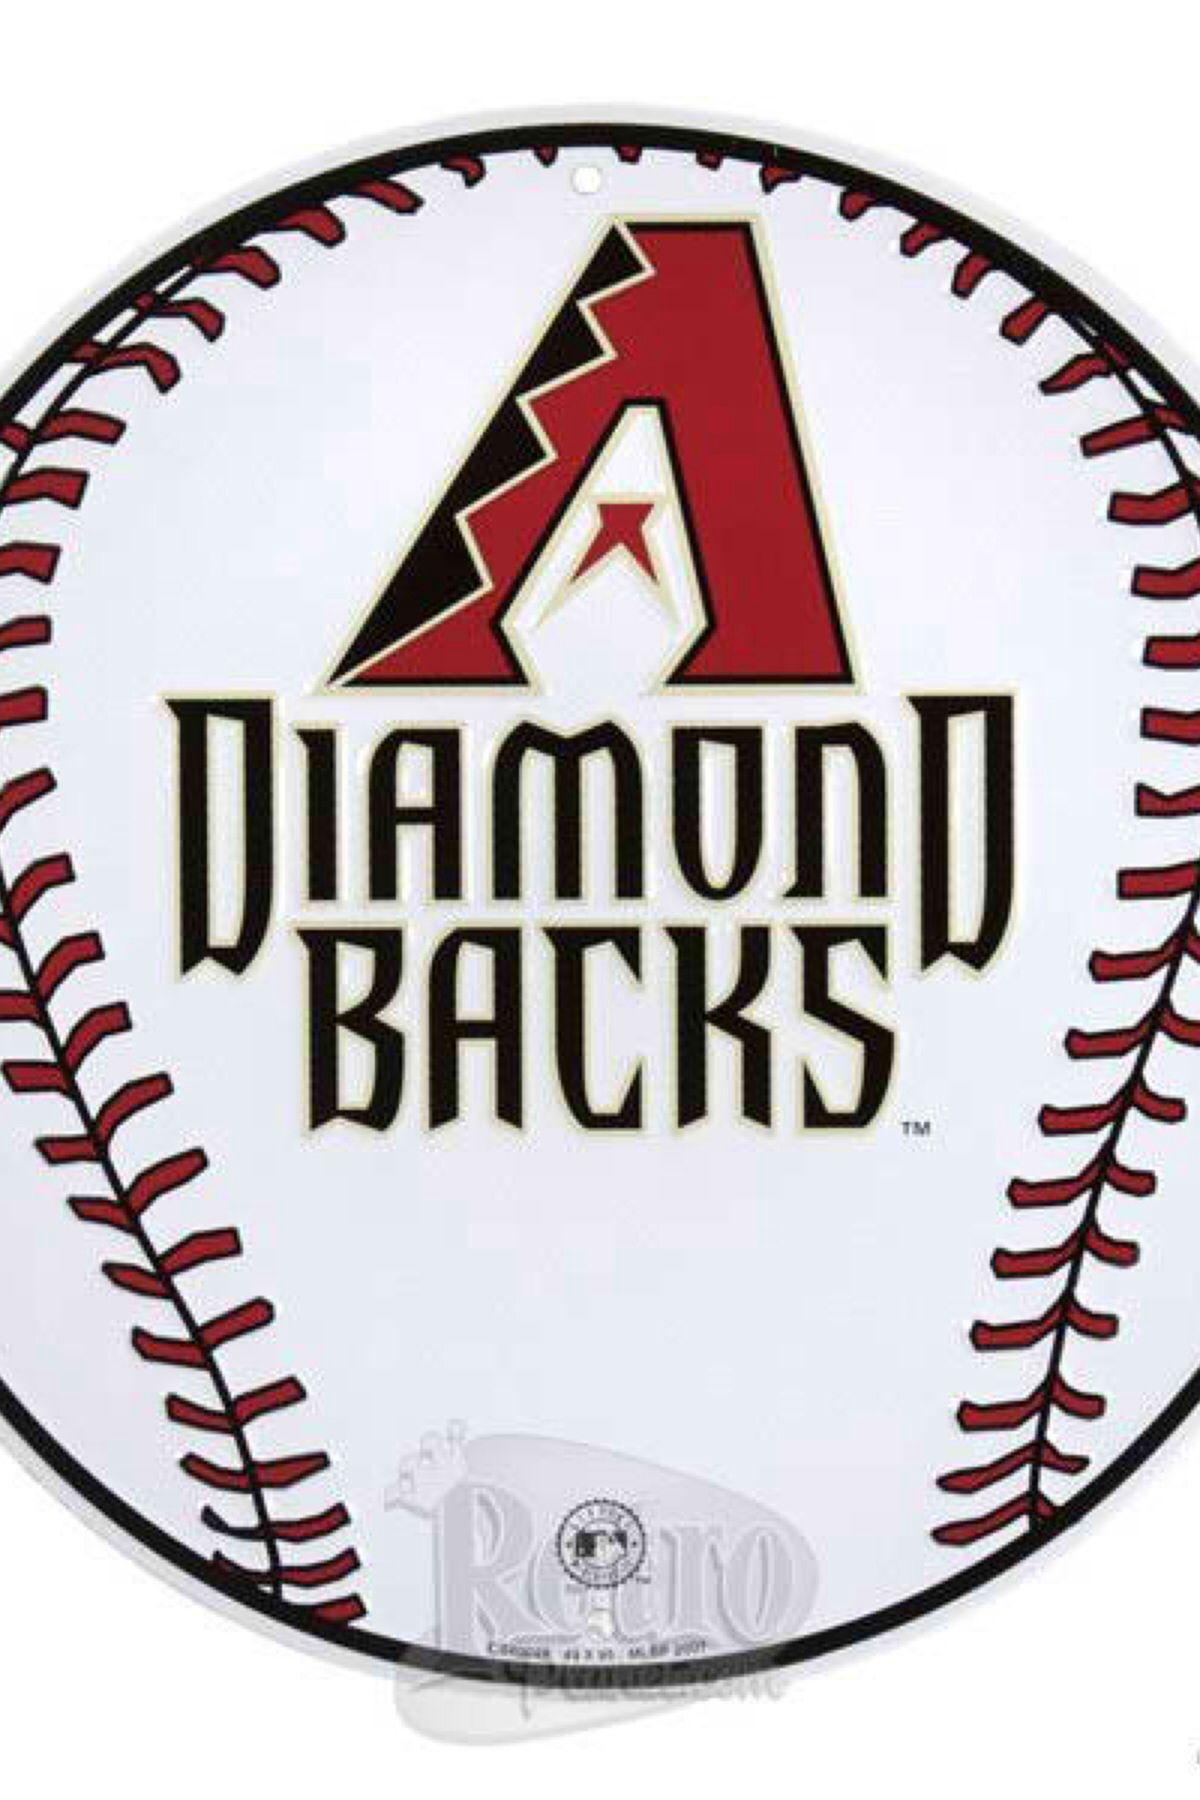 Arizona Diamondbacks baseball Diamondbacks, Arizona